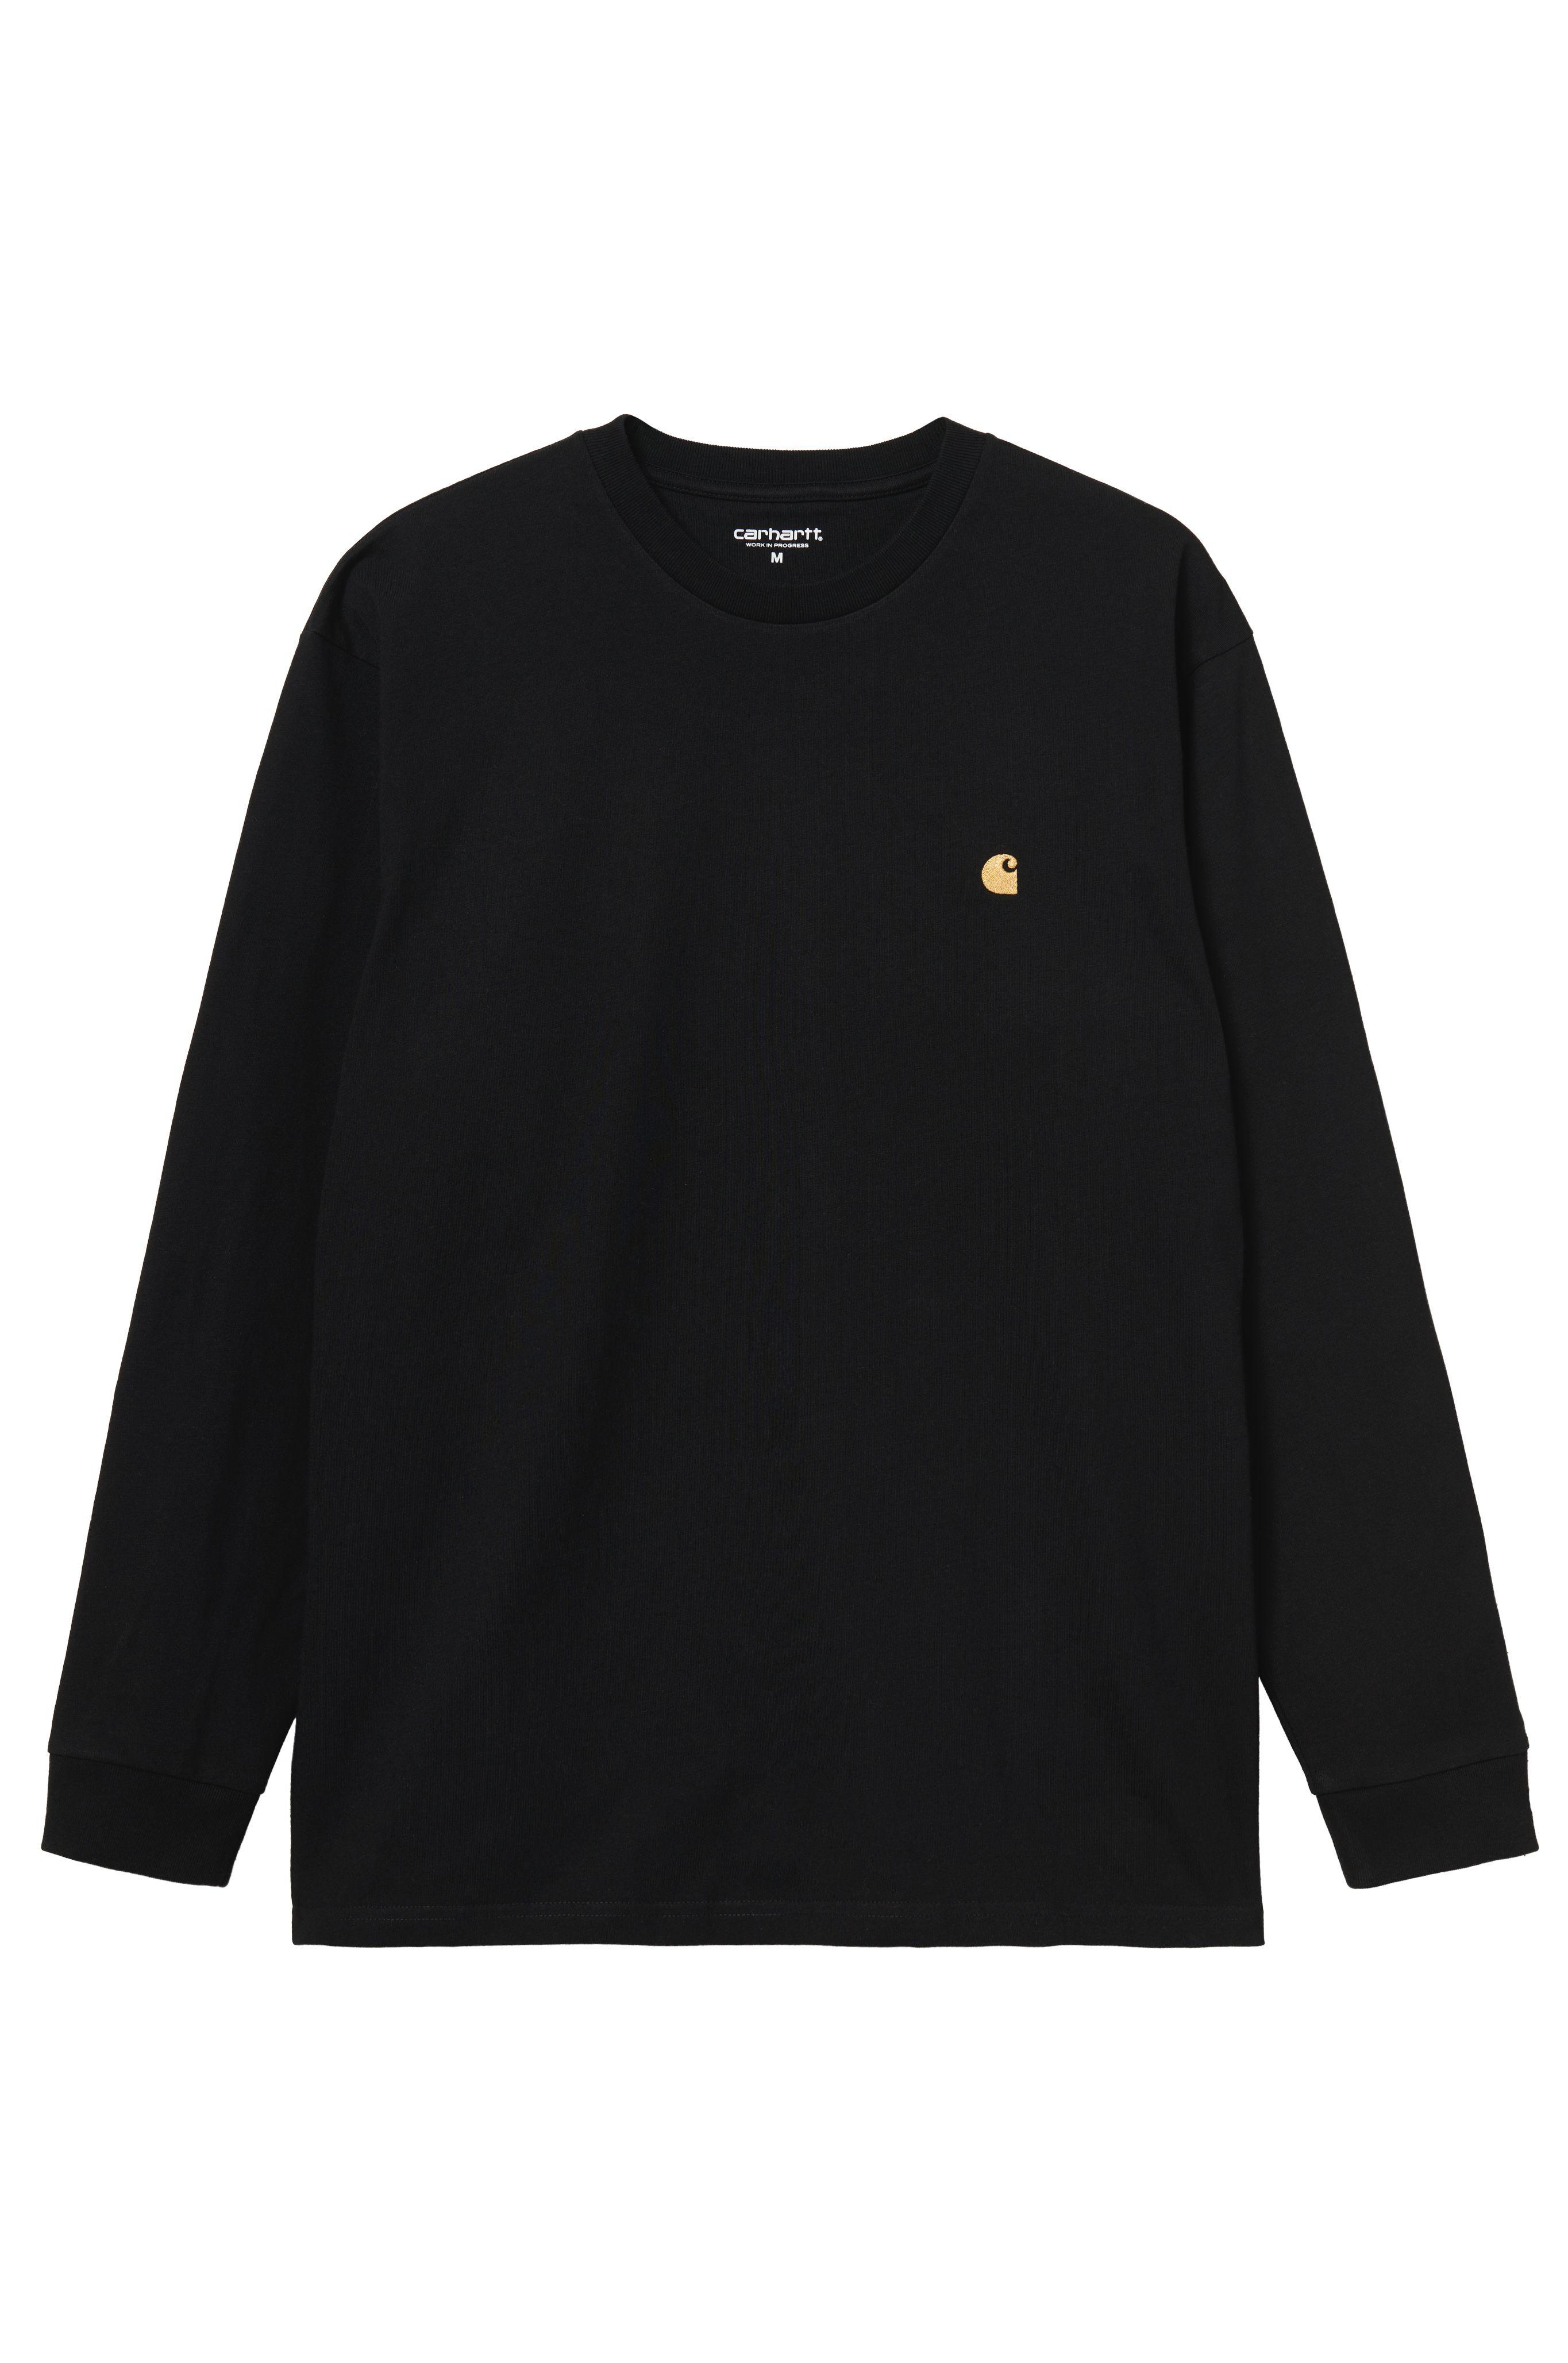 L-Sleeve Carhartt WIP CHASE Black/Gold